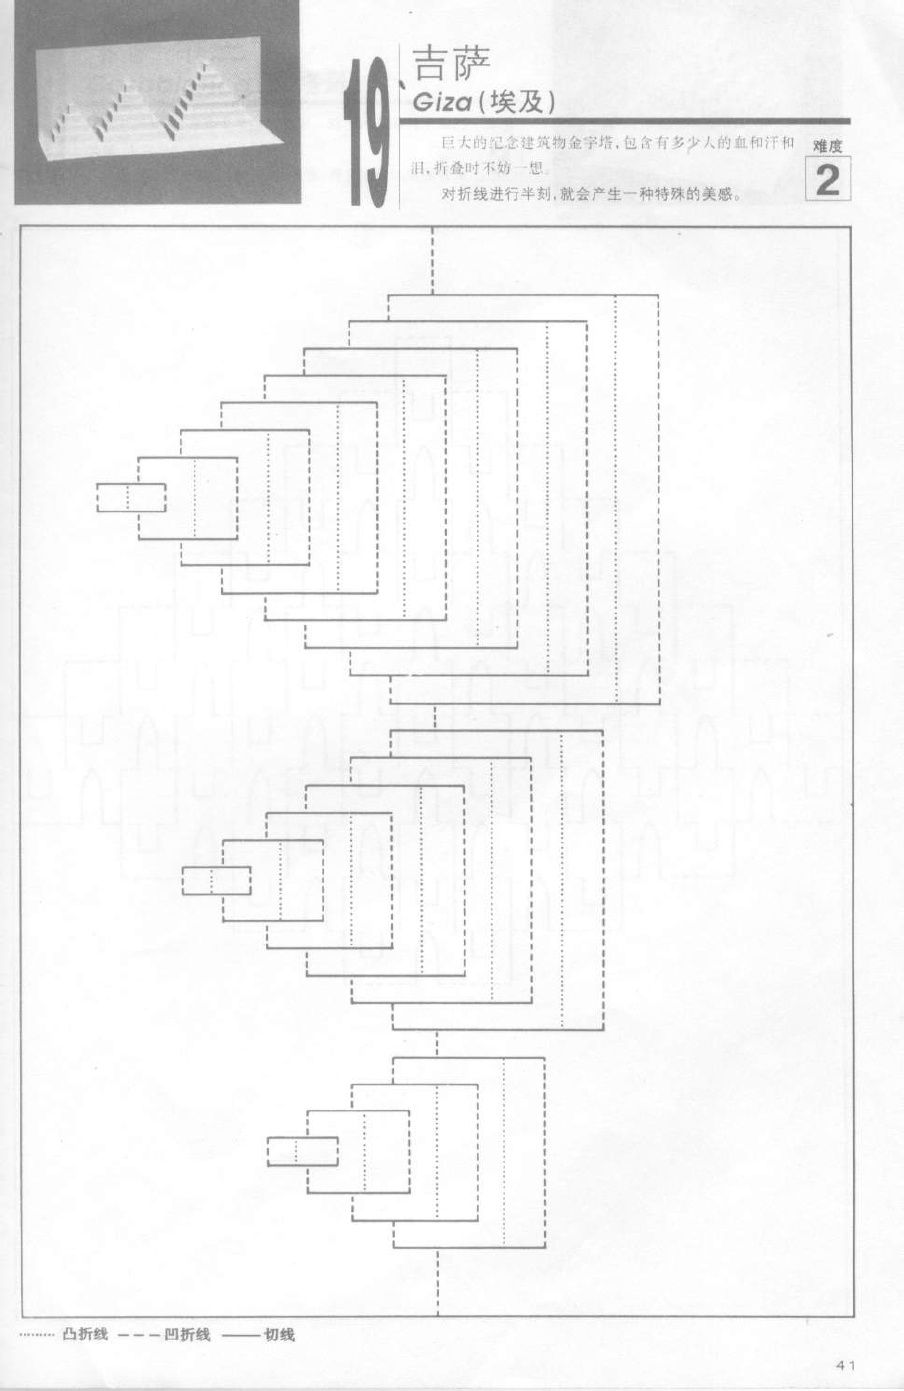 Pin de HARRY GAMBOA en PAPER TOYS | Pinterest | Kirigami, Papel y ...